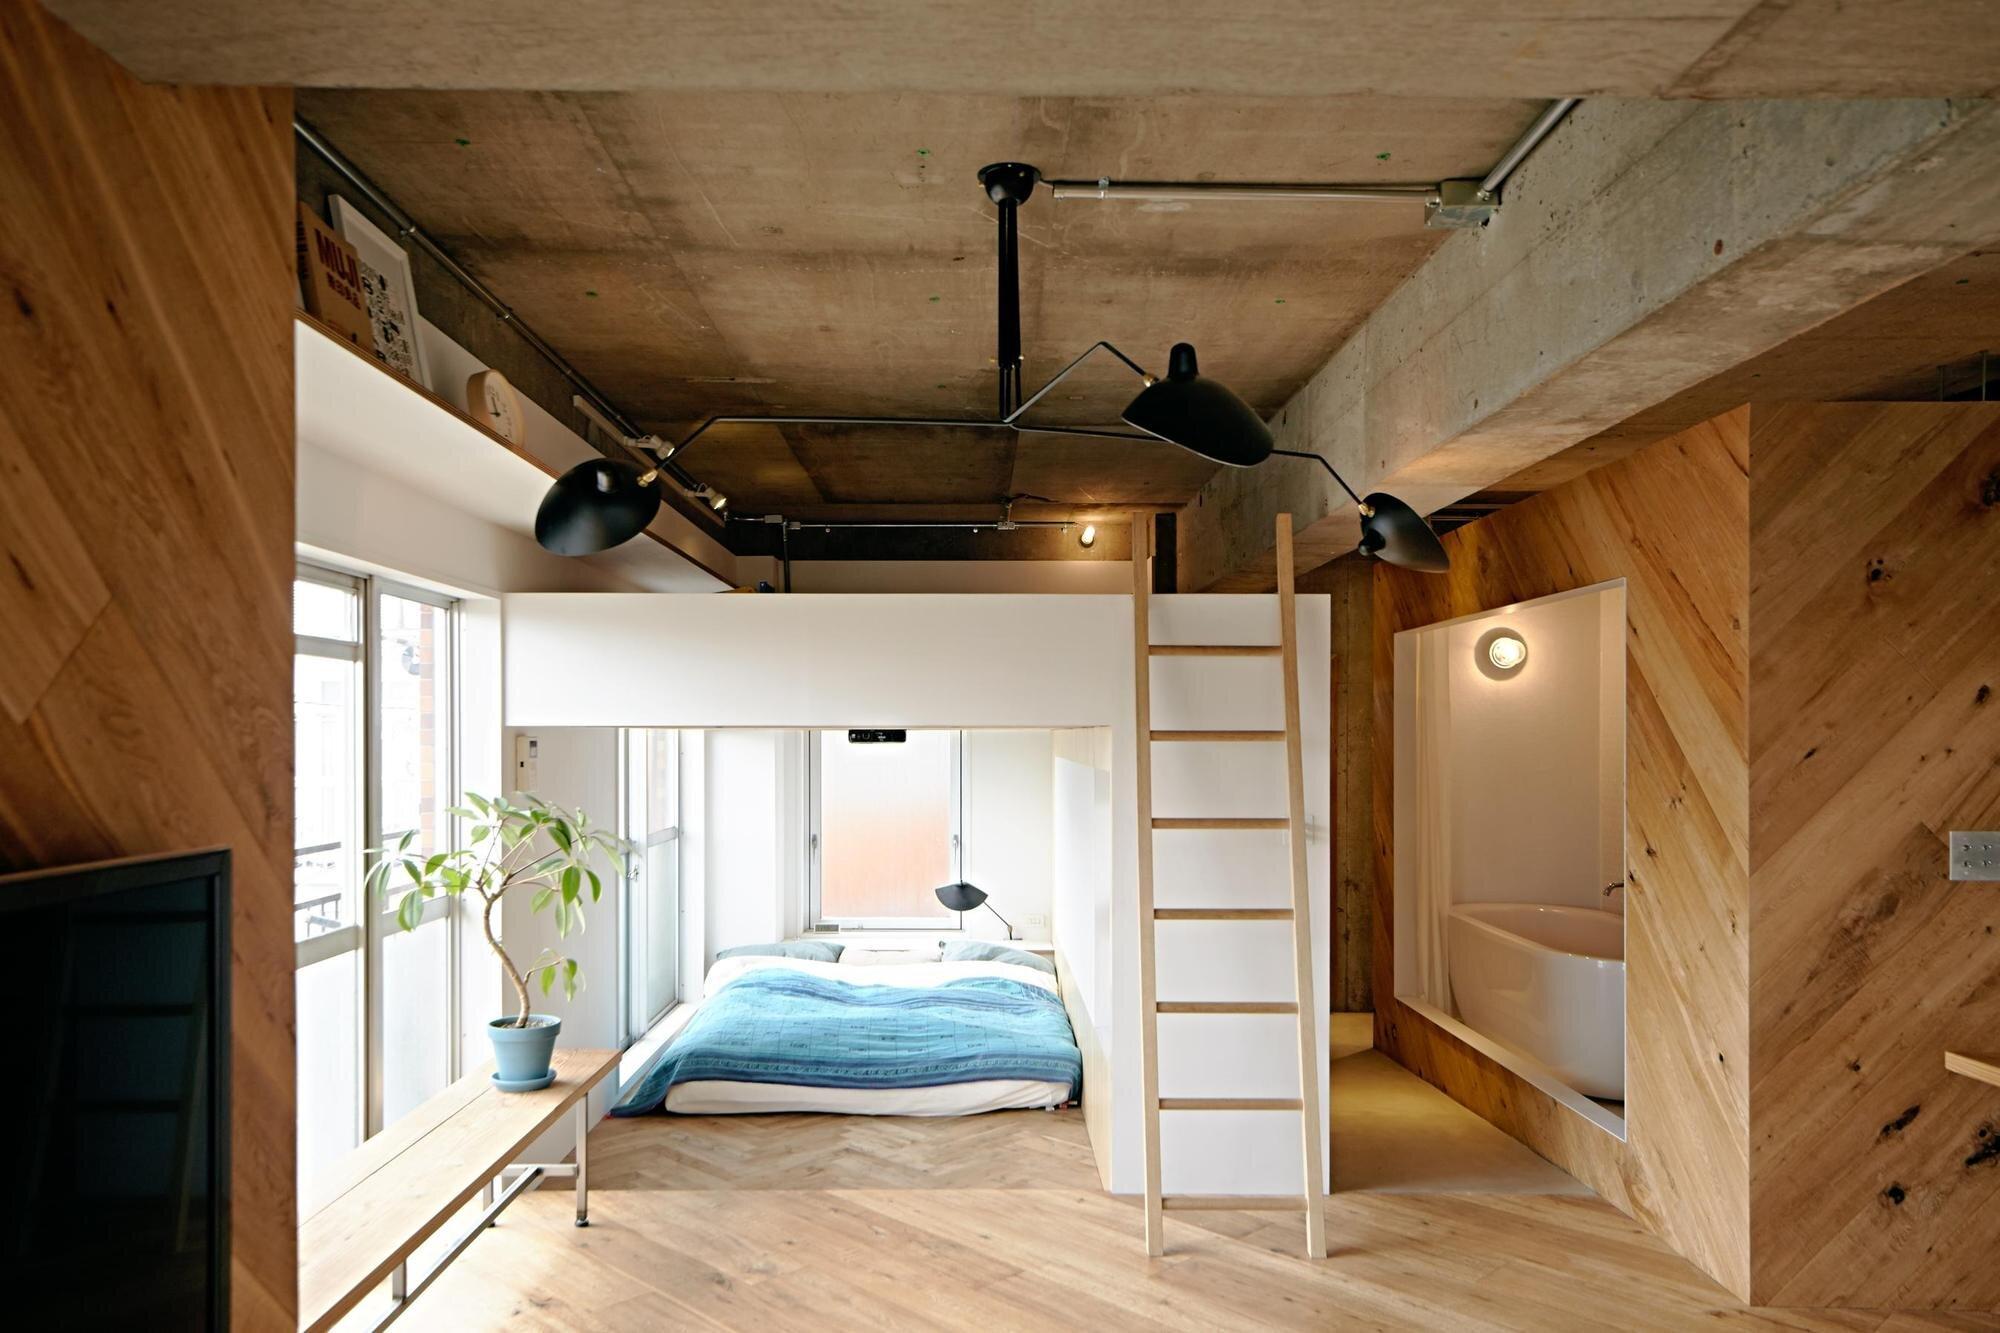 Tenhachi House - .8 Tenhachi Architect & Interior Design - Tokyo - Bedroom - Humble Homes